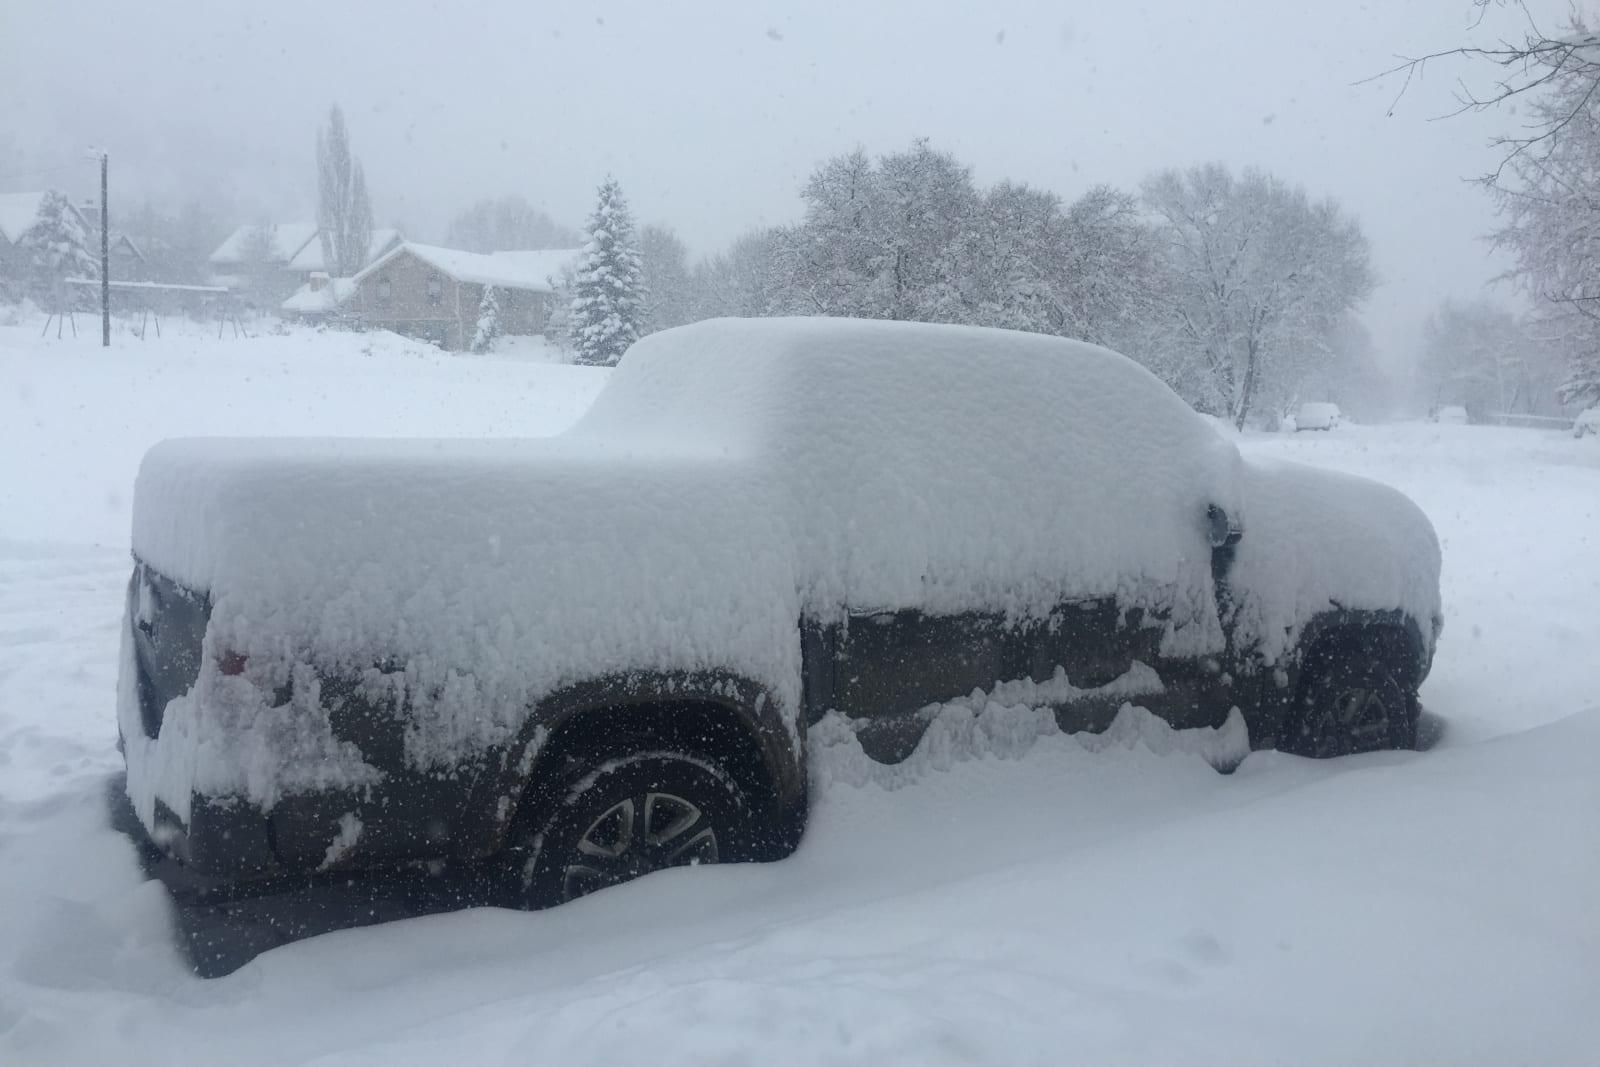 Mountain Living Durango Colorado Truck Covered In Snow Winter